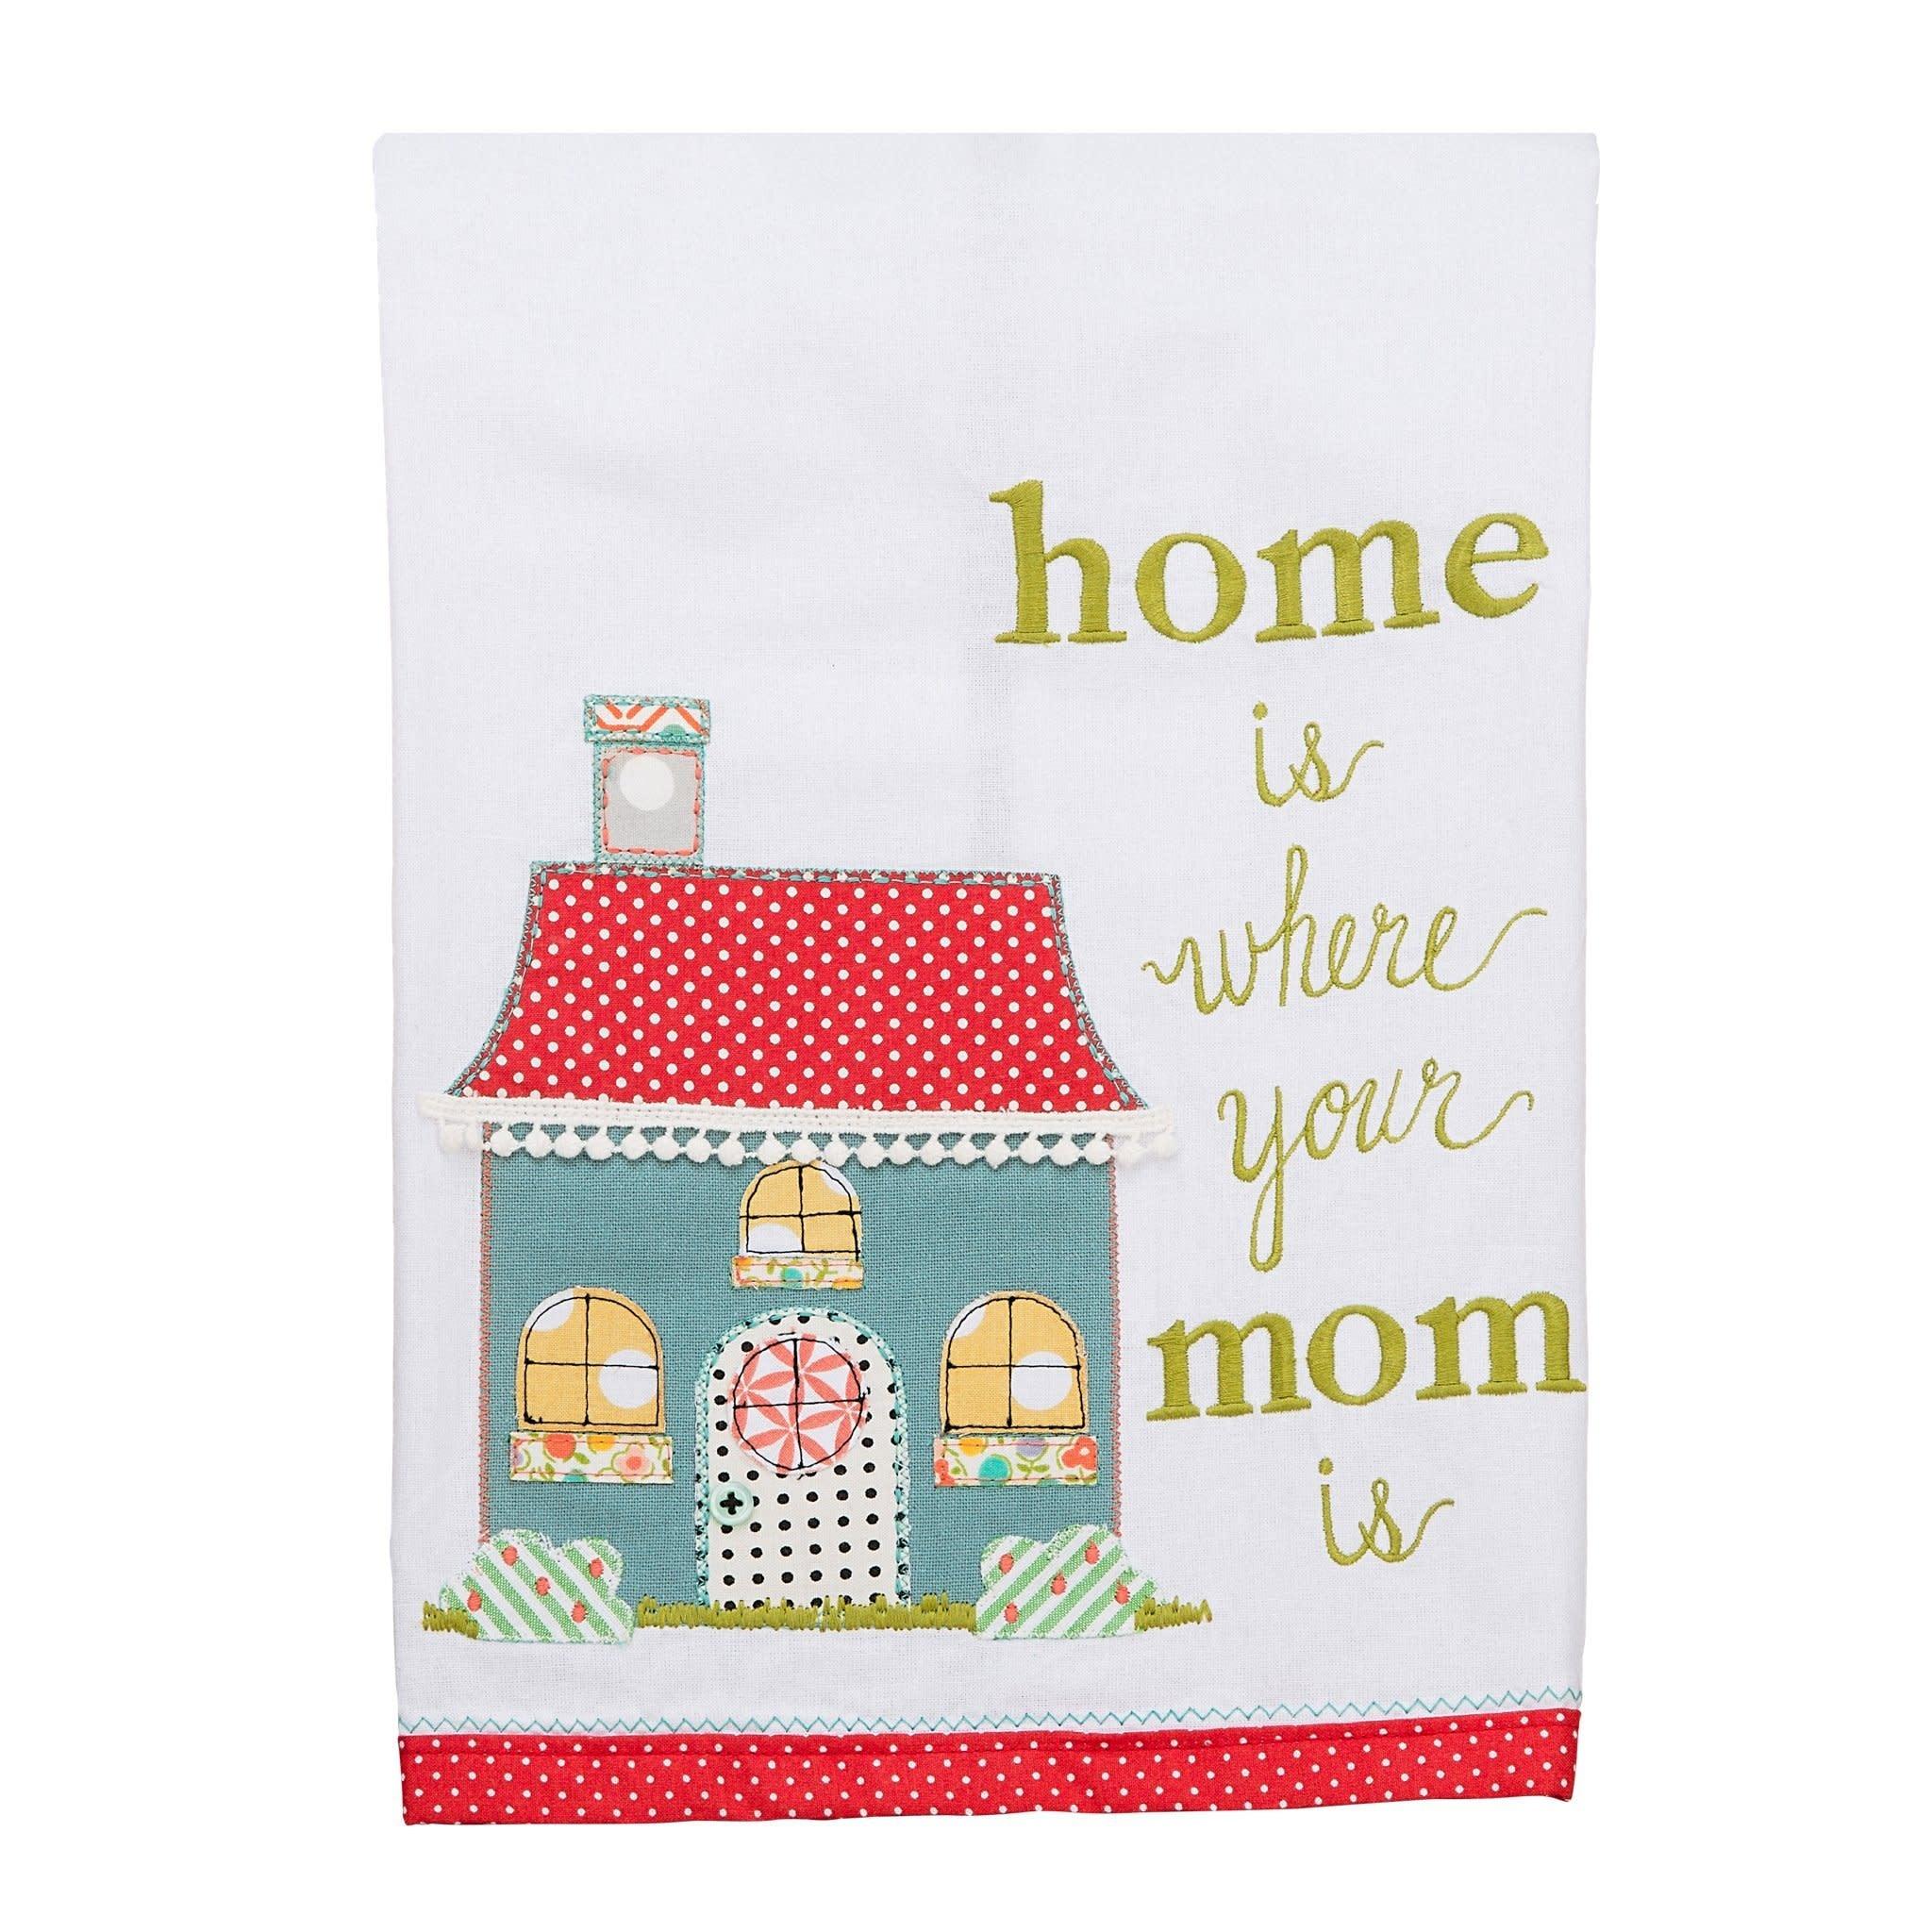 GLORY HAUS HOME IS WHERE YOUR MOM IS TEA TOWEL